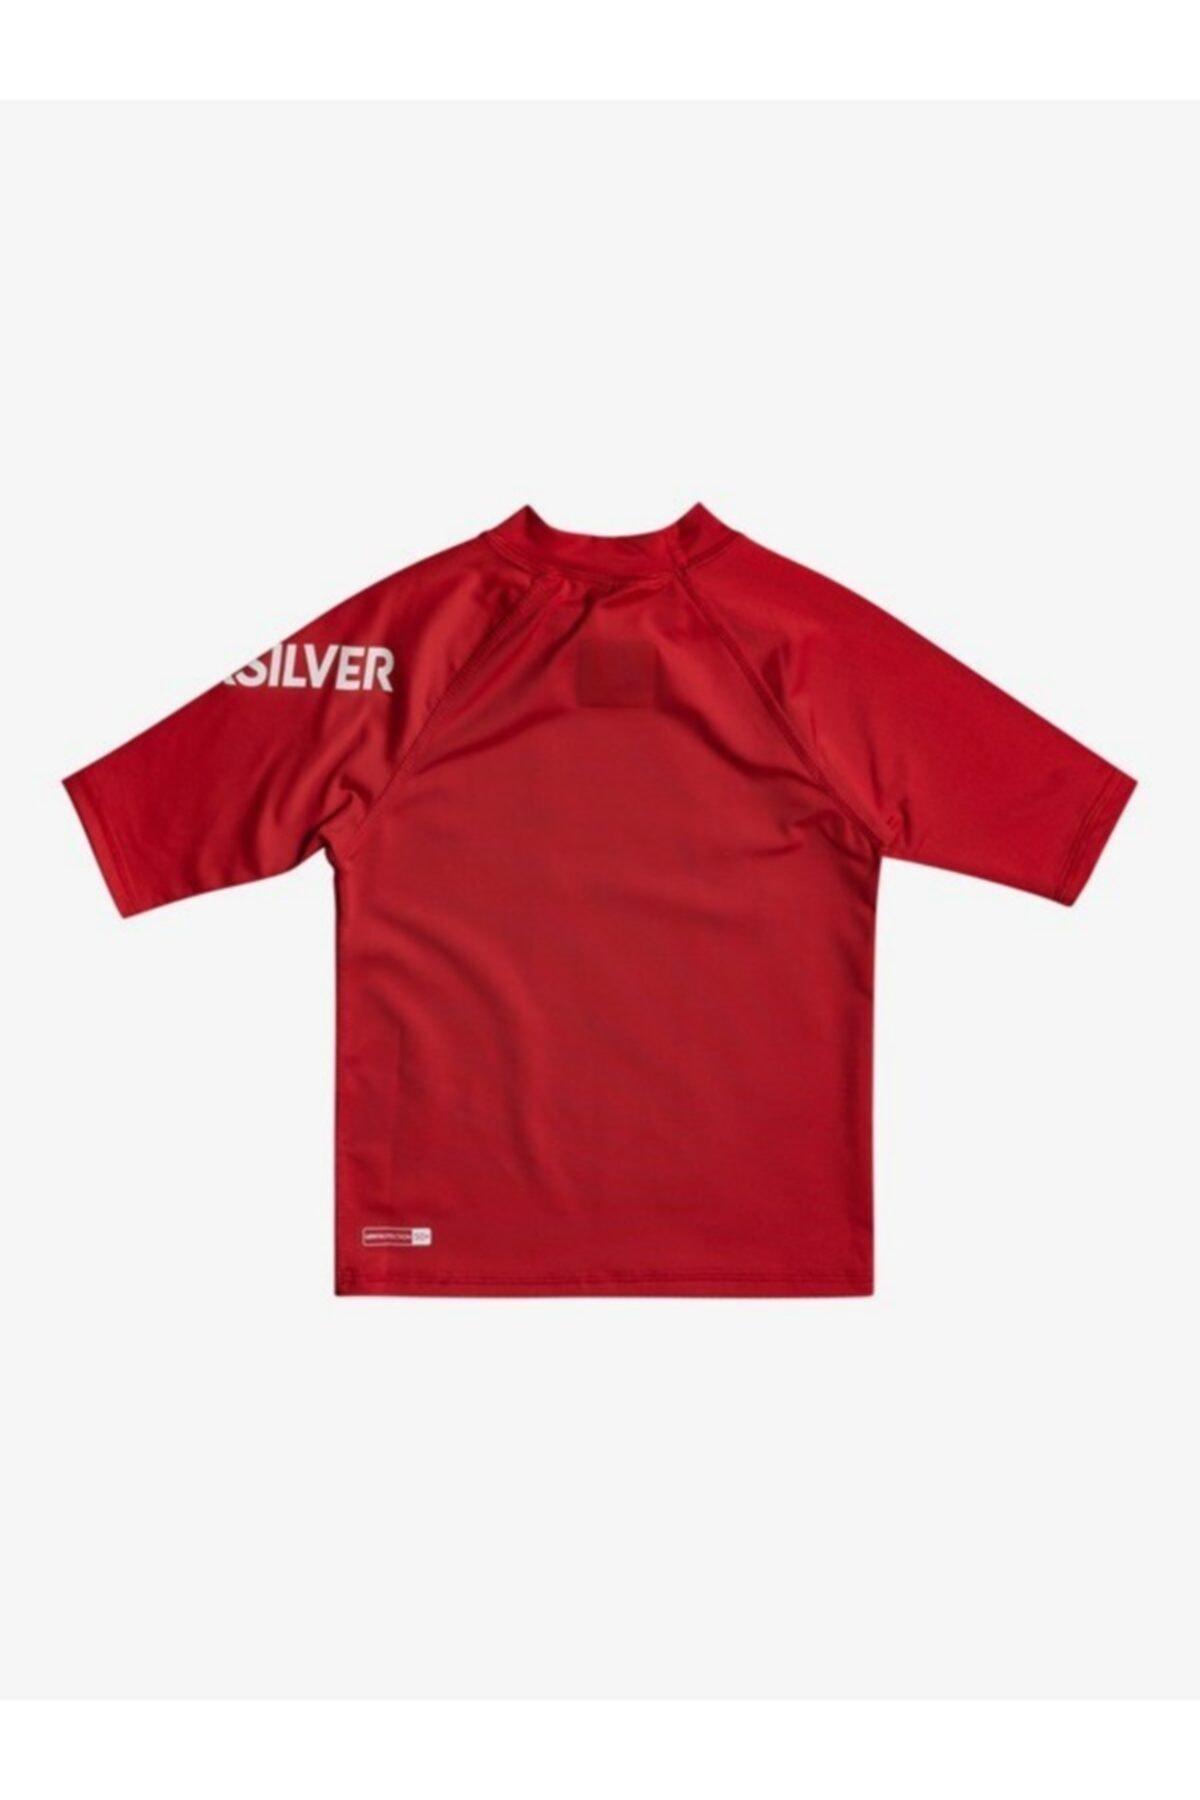 Quiksilver Eqkwr03077-rqc0 Alltimssboy K Sfsh Çocuk Yüzücü T-shirt 2